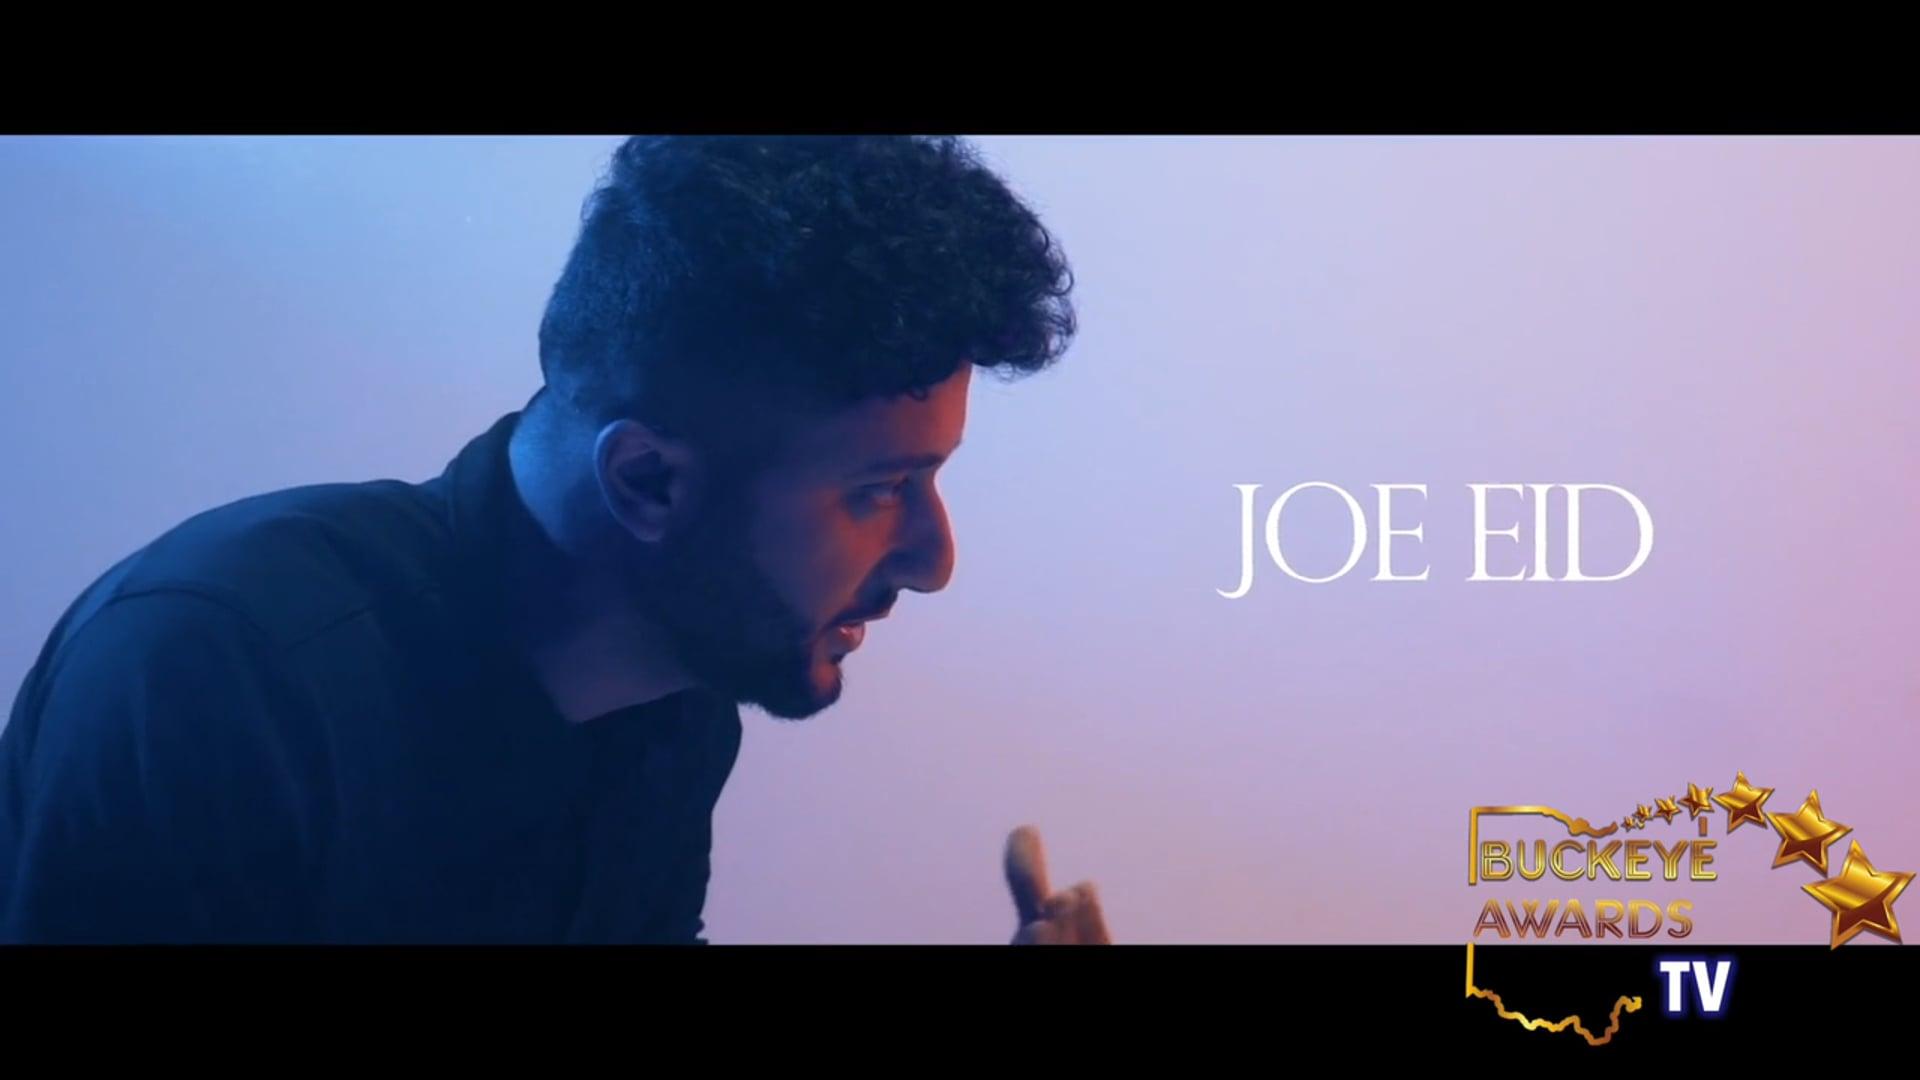 Buckeye Awards TV - interview with Joe Eid